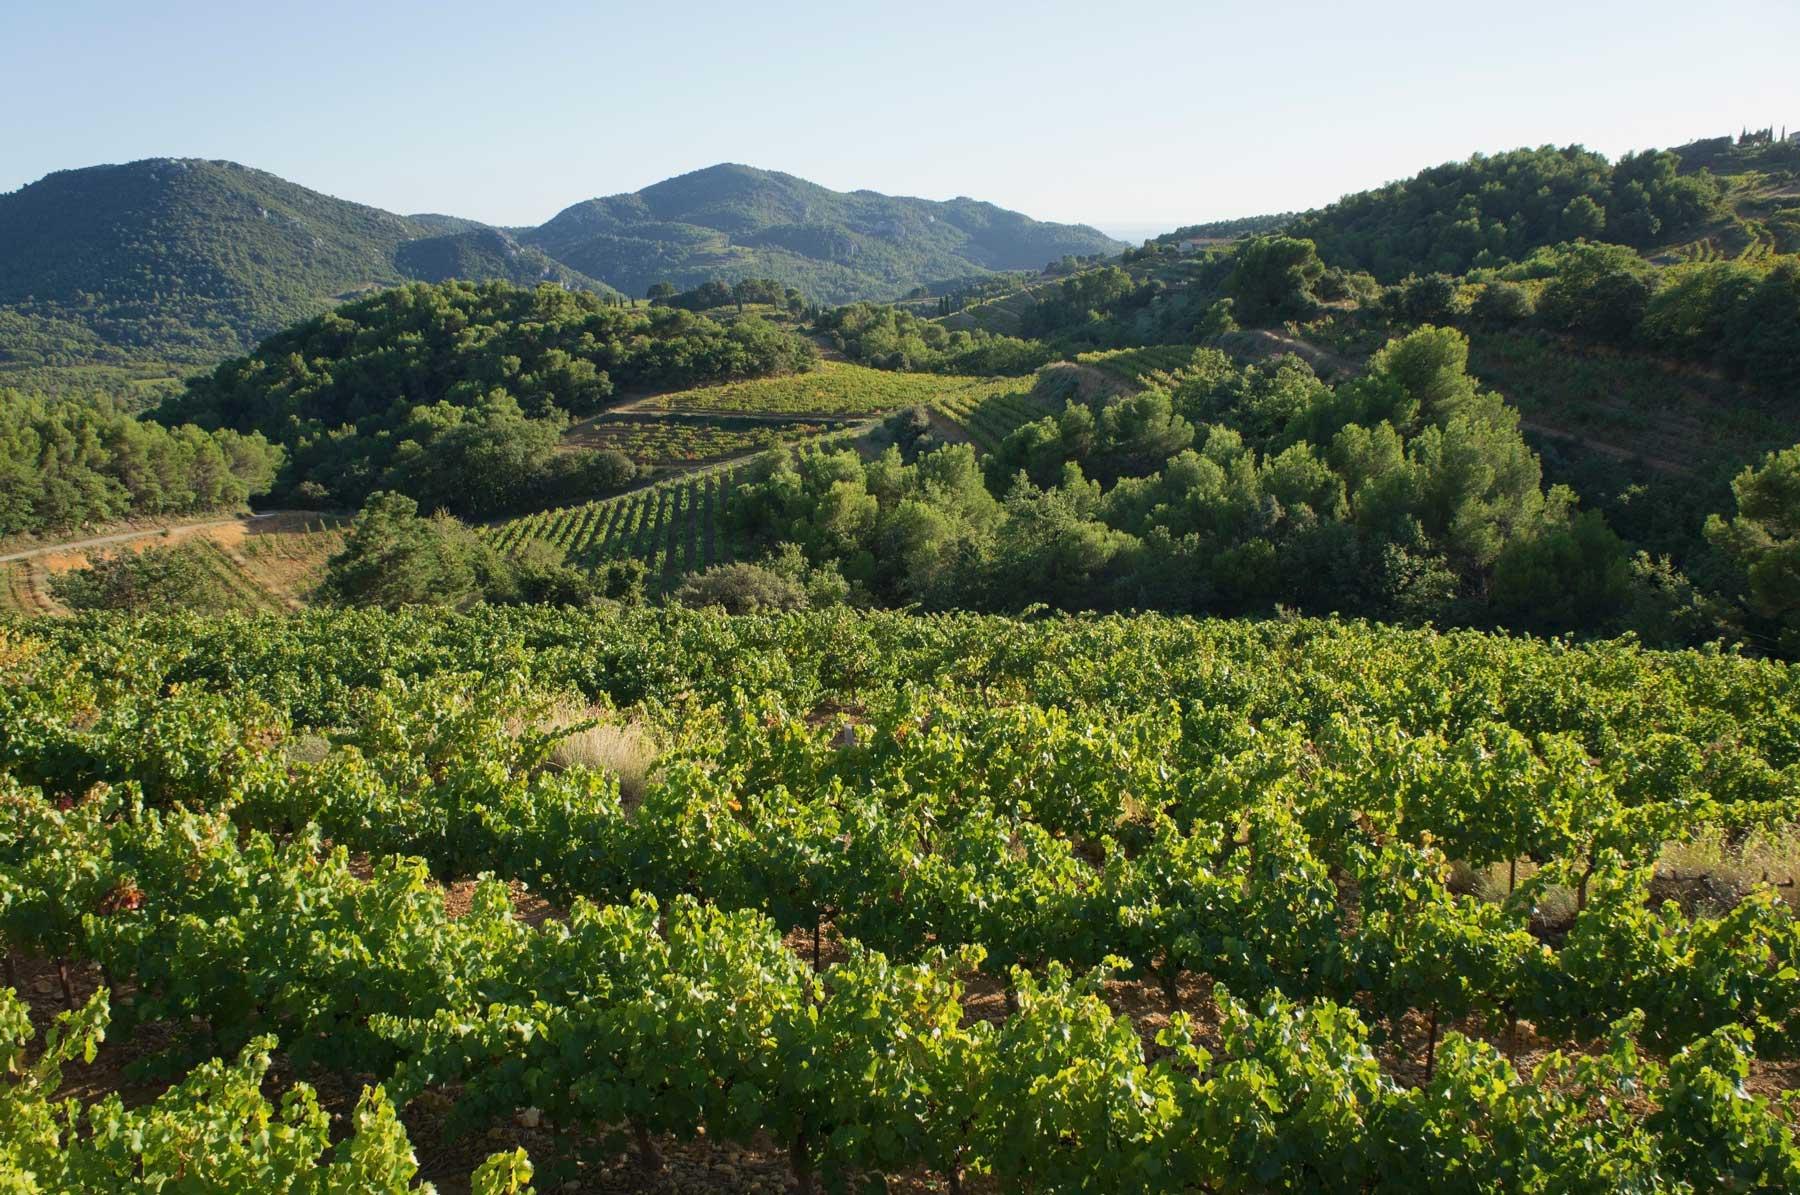 A beautiful, green landscape of lush wine vineyards.